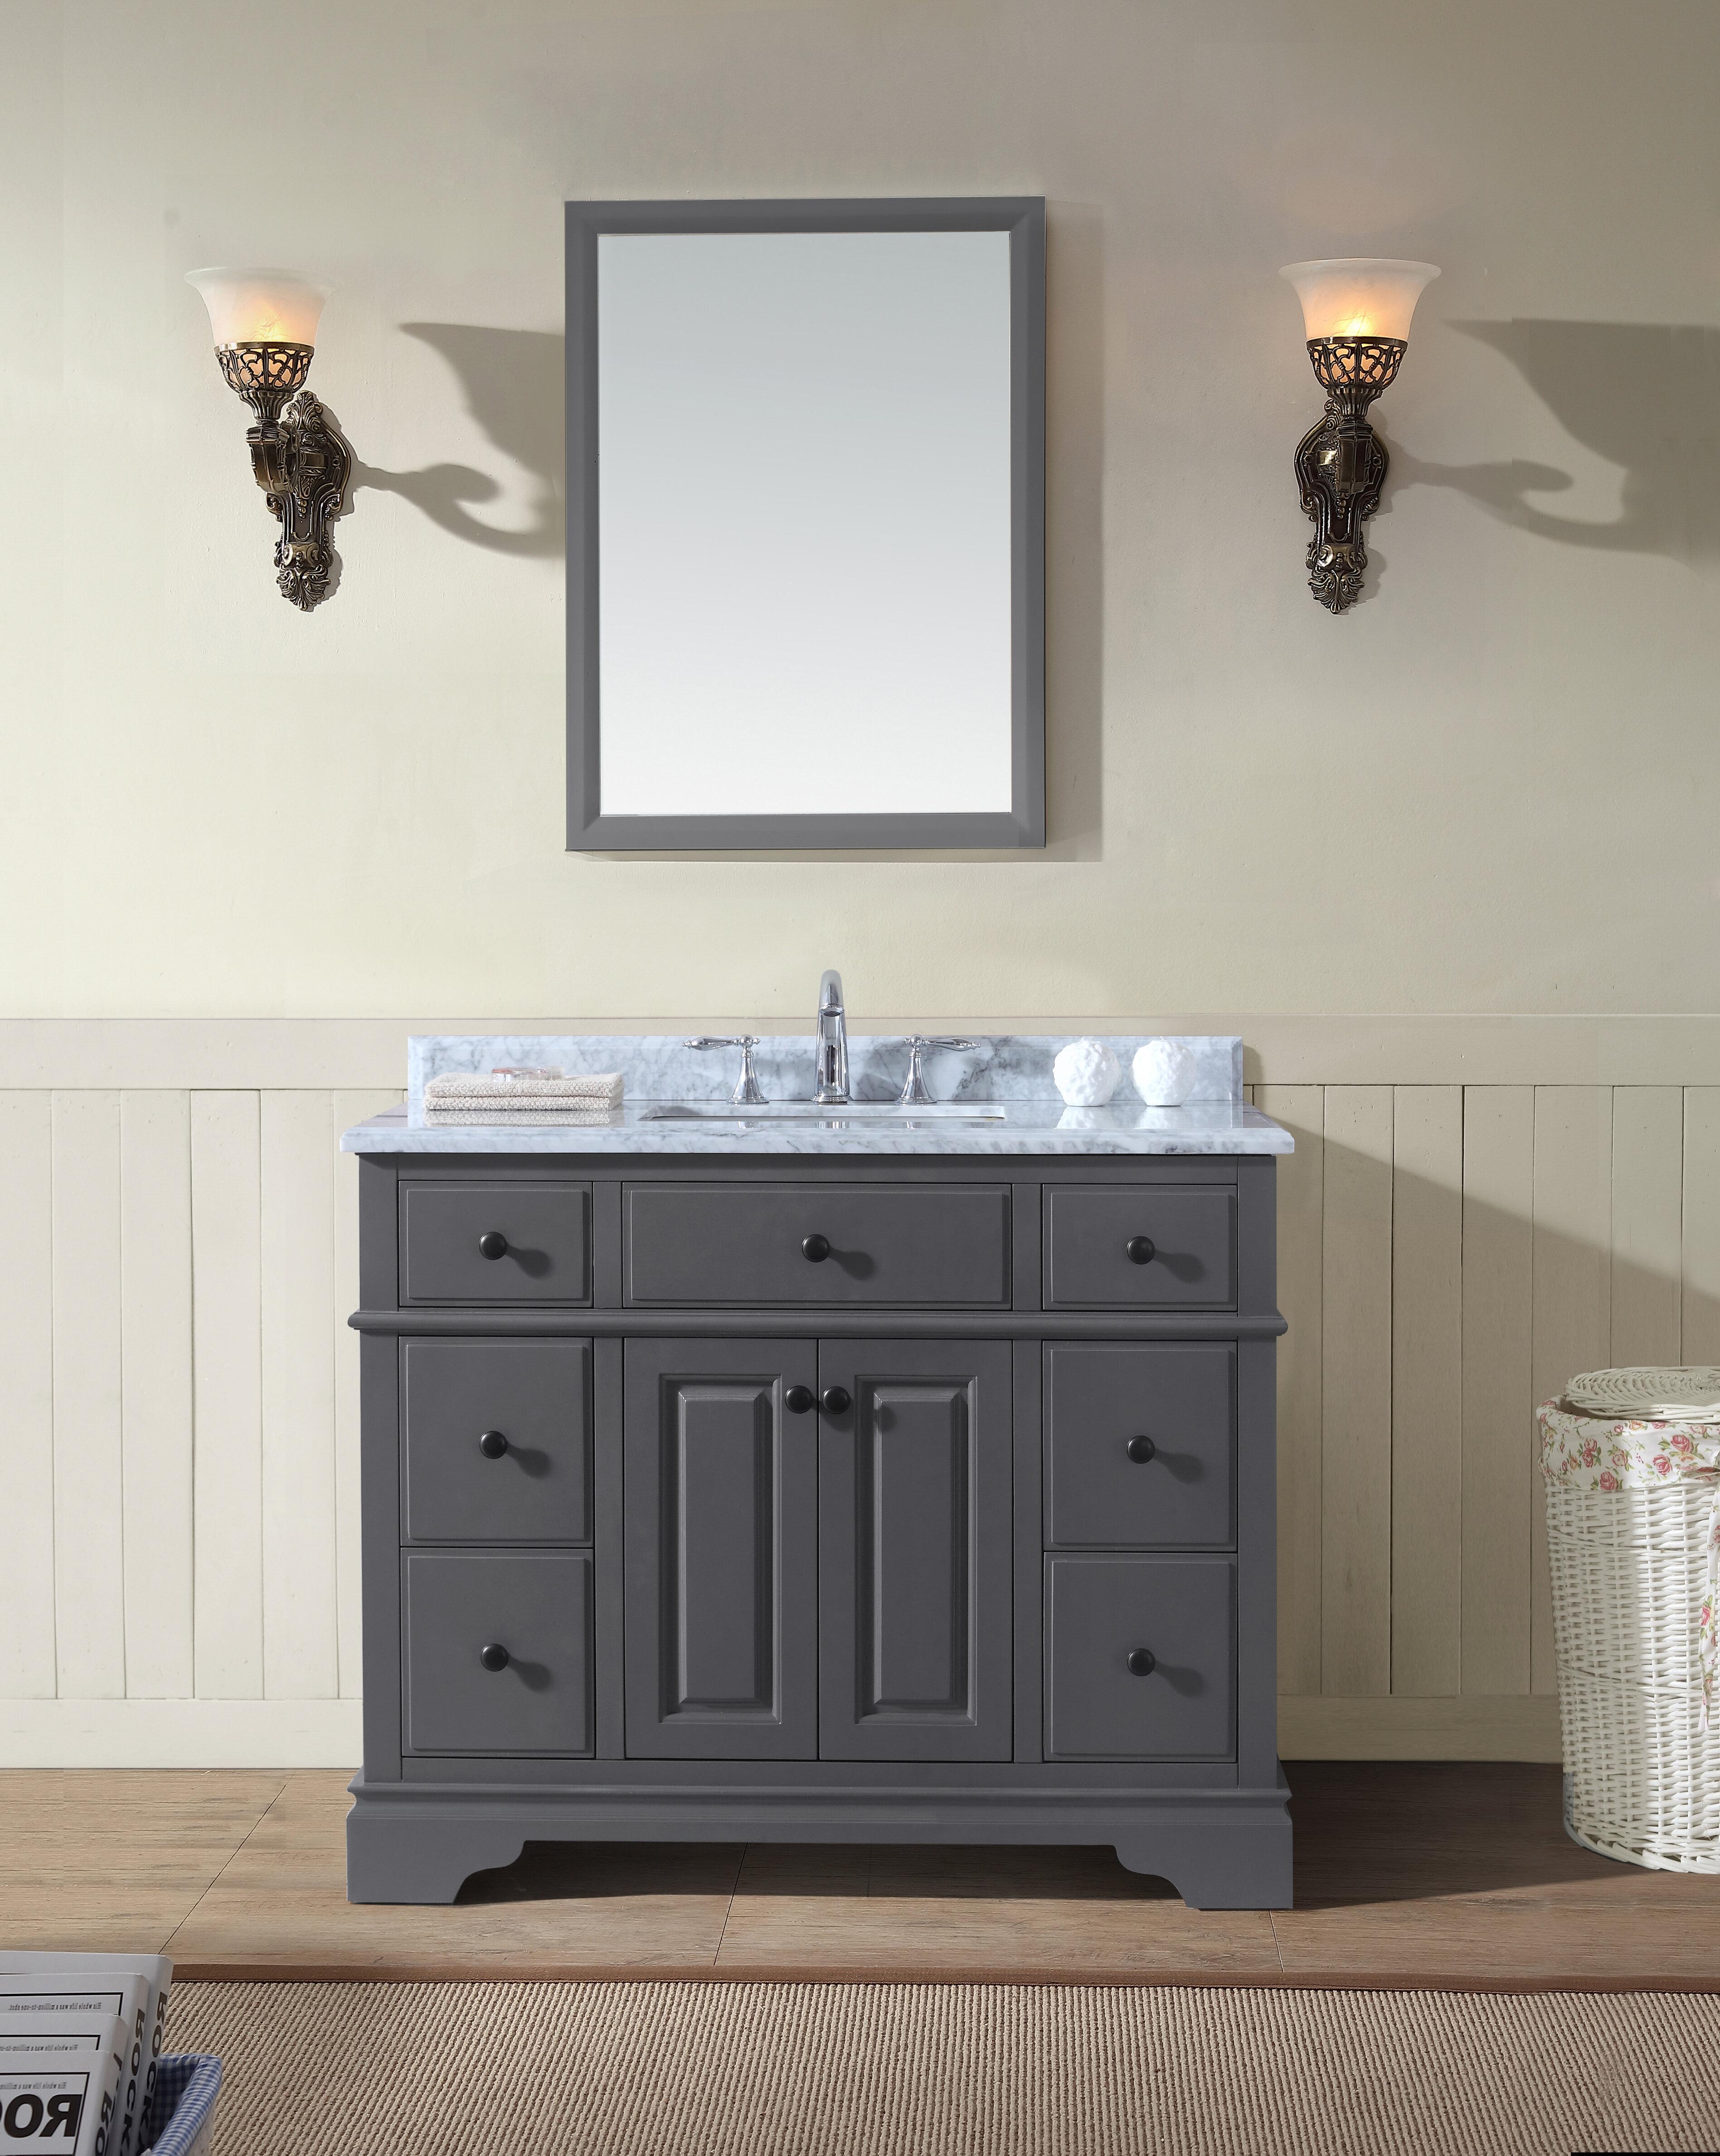 Sets bathroom vanity ari kitchen second - Ari Kitchen Bath Chela 42 Single Bathroom Vanity Set Reviews Wayfair